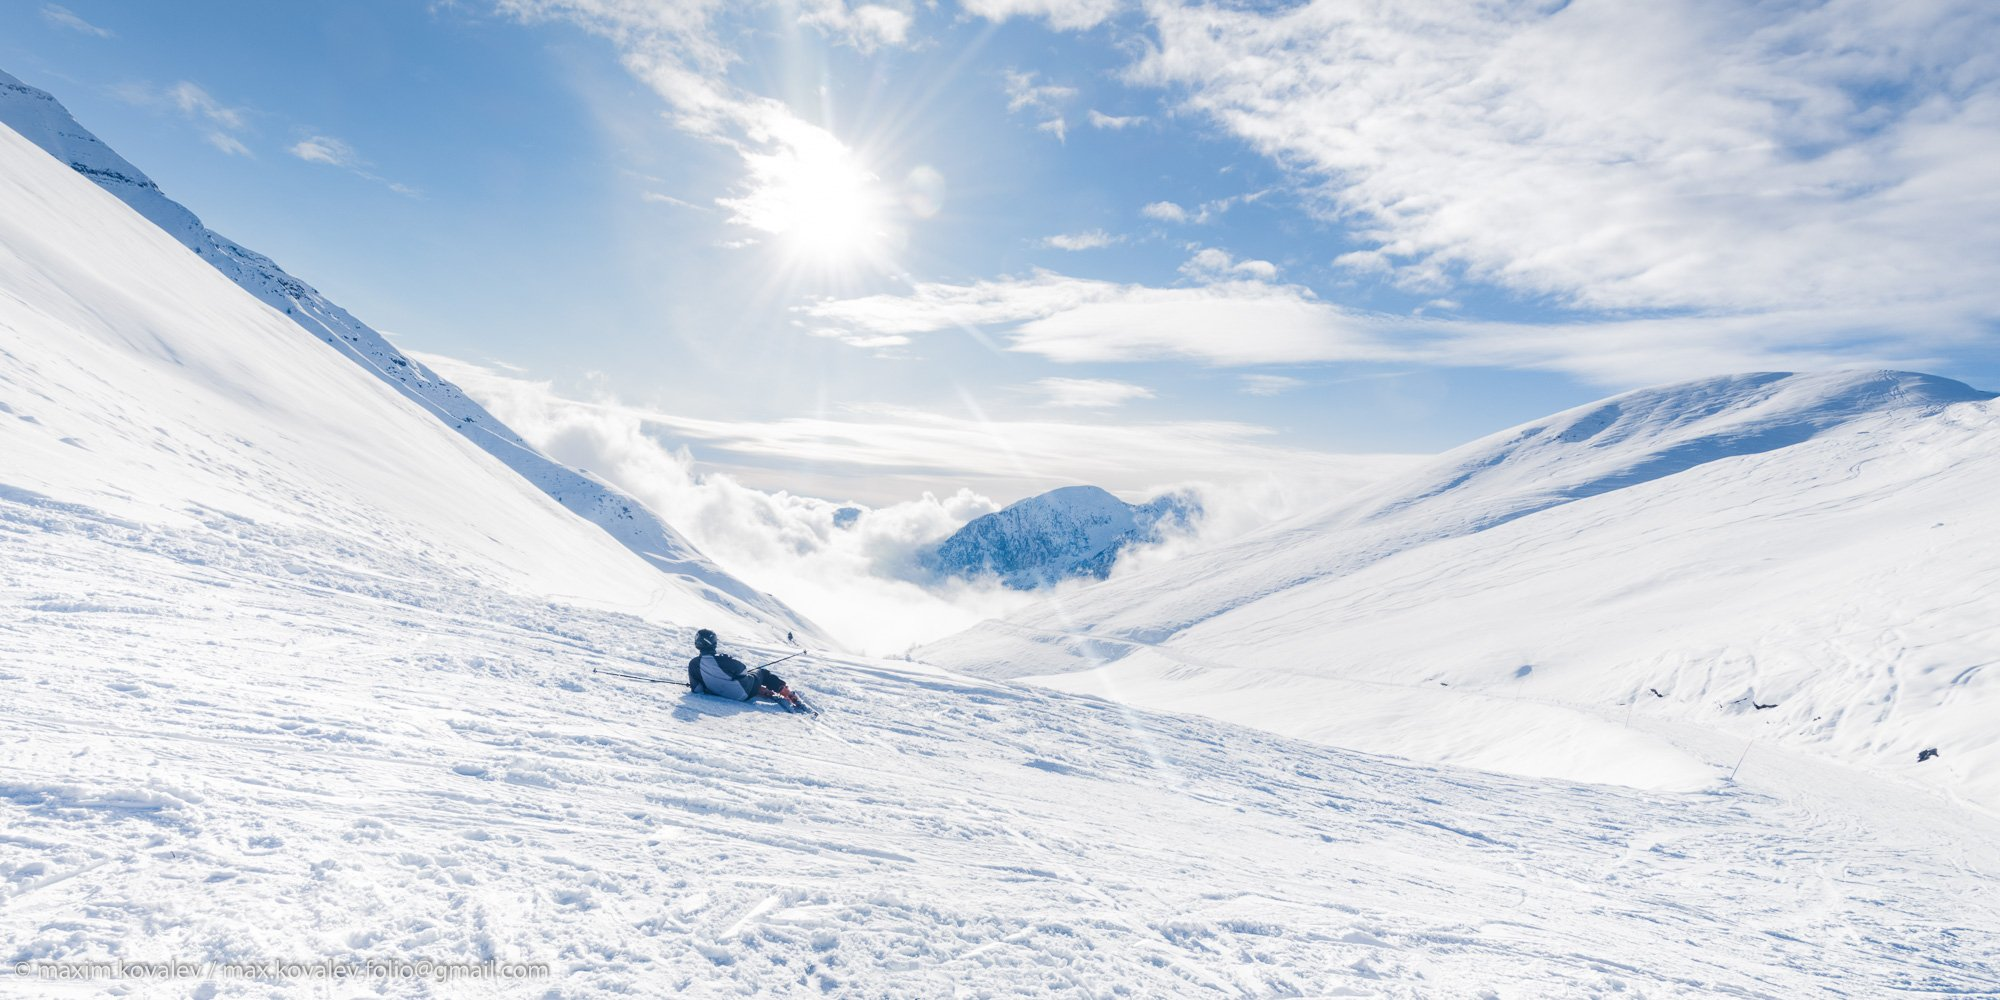 europe, italy, cloud, mountain, nature, snow, winter, европа, италия, гора, зима, облако, природа, снег, лыжи, лыжник, дзен, zen, ski, skiing,skier, alps, альпы, Ковалёв Максим